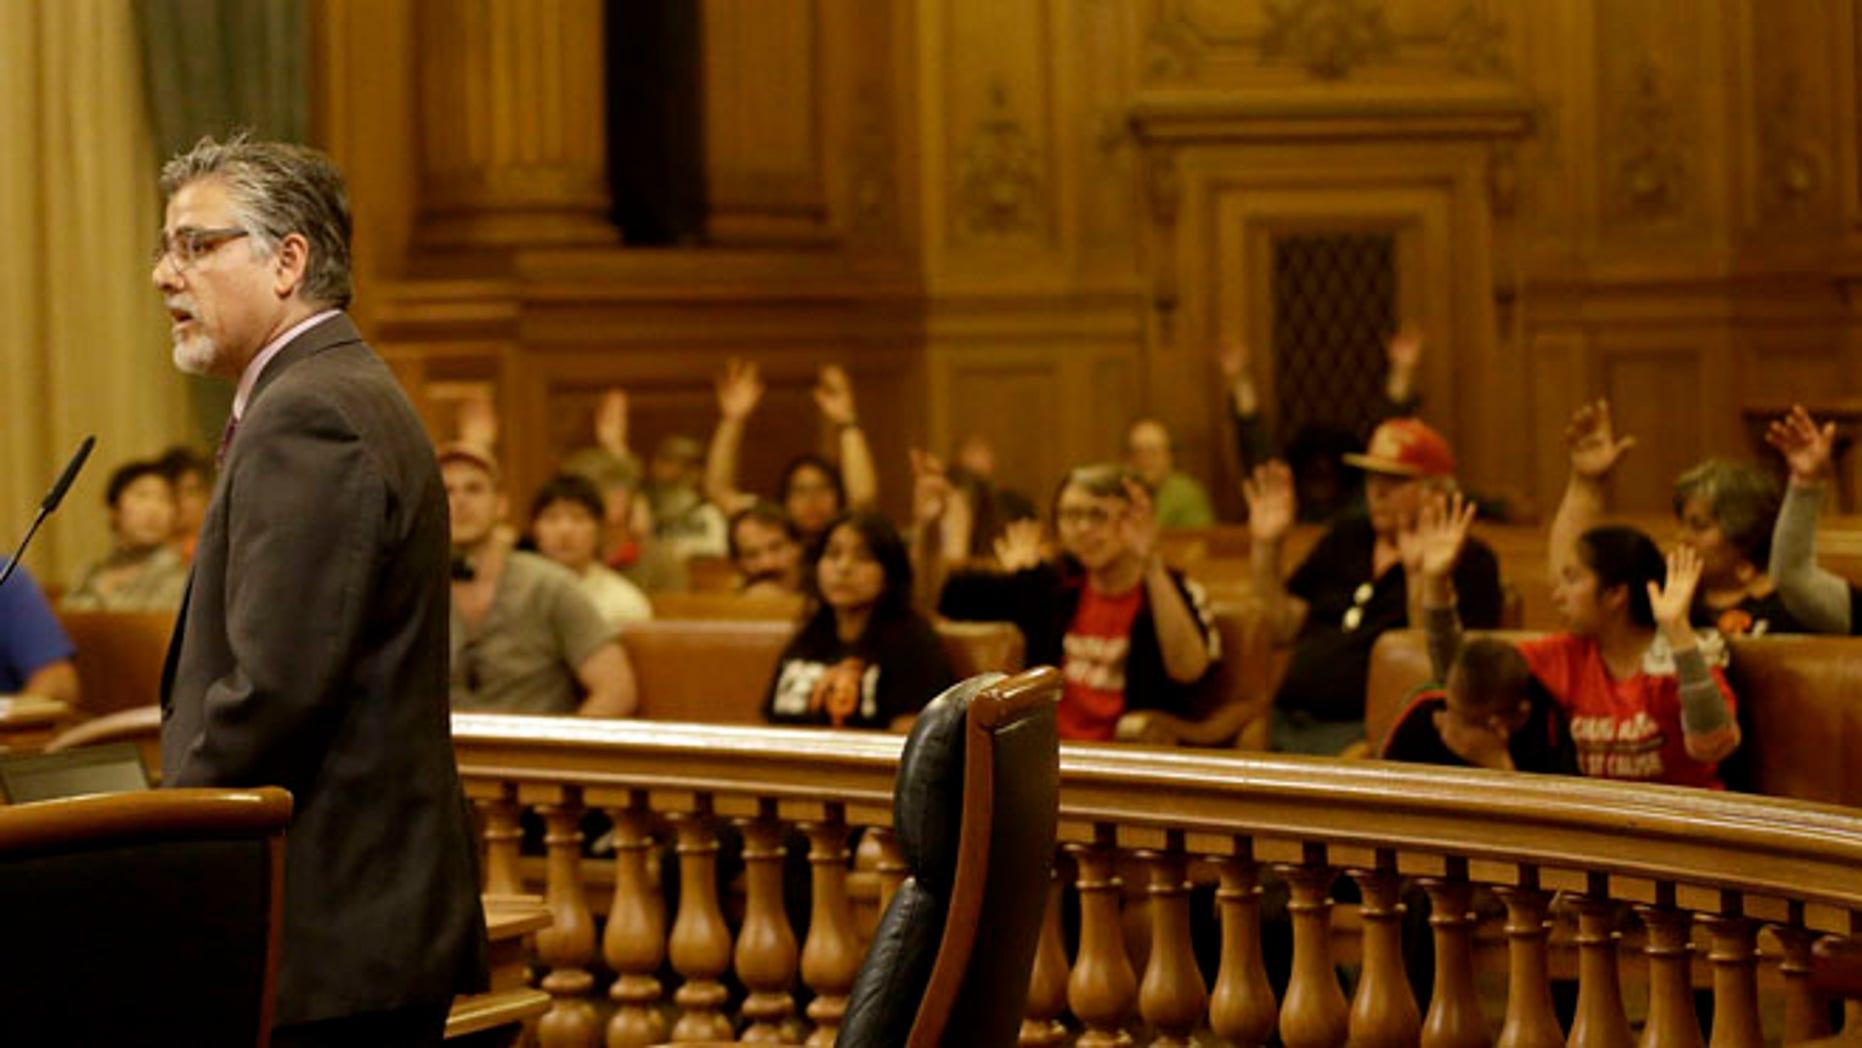 Supervisor John Avalos during a Board of Supervisors meeting at City Hall in San Francisco, May 10, 2016.